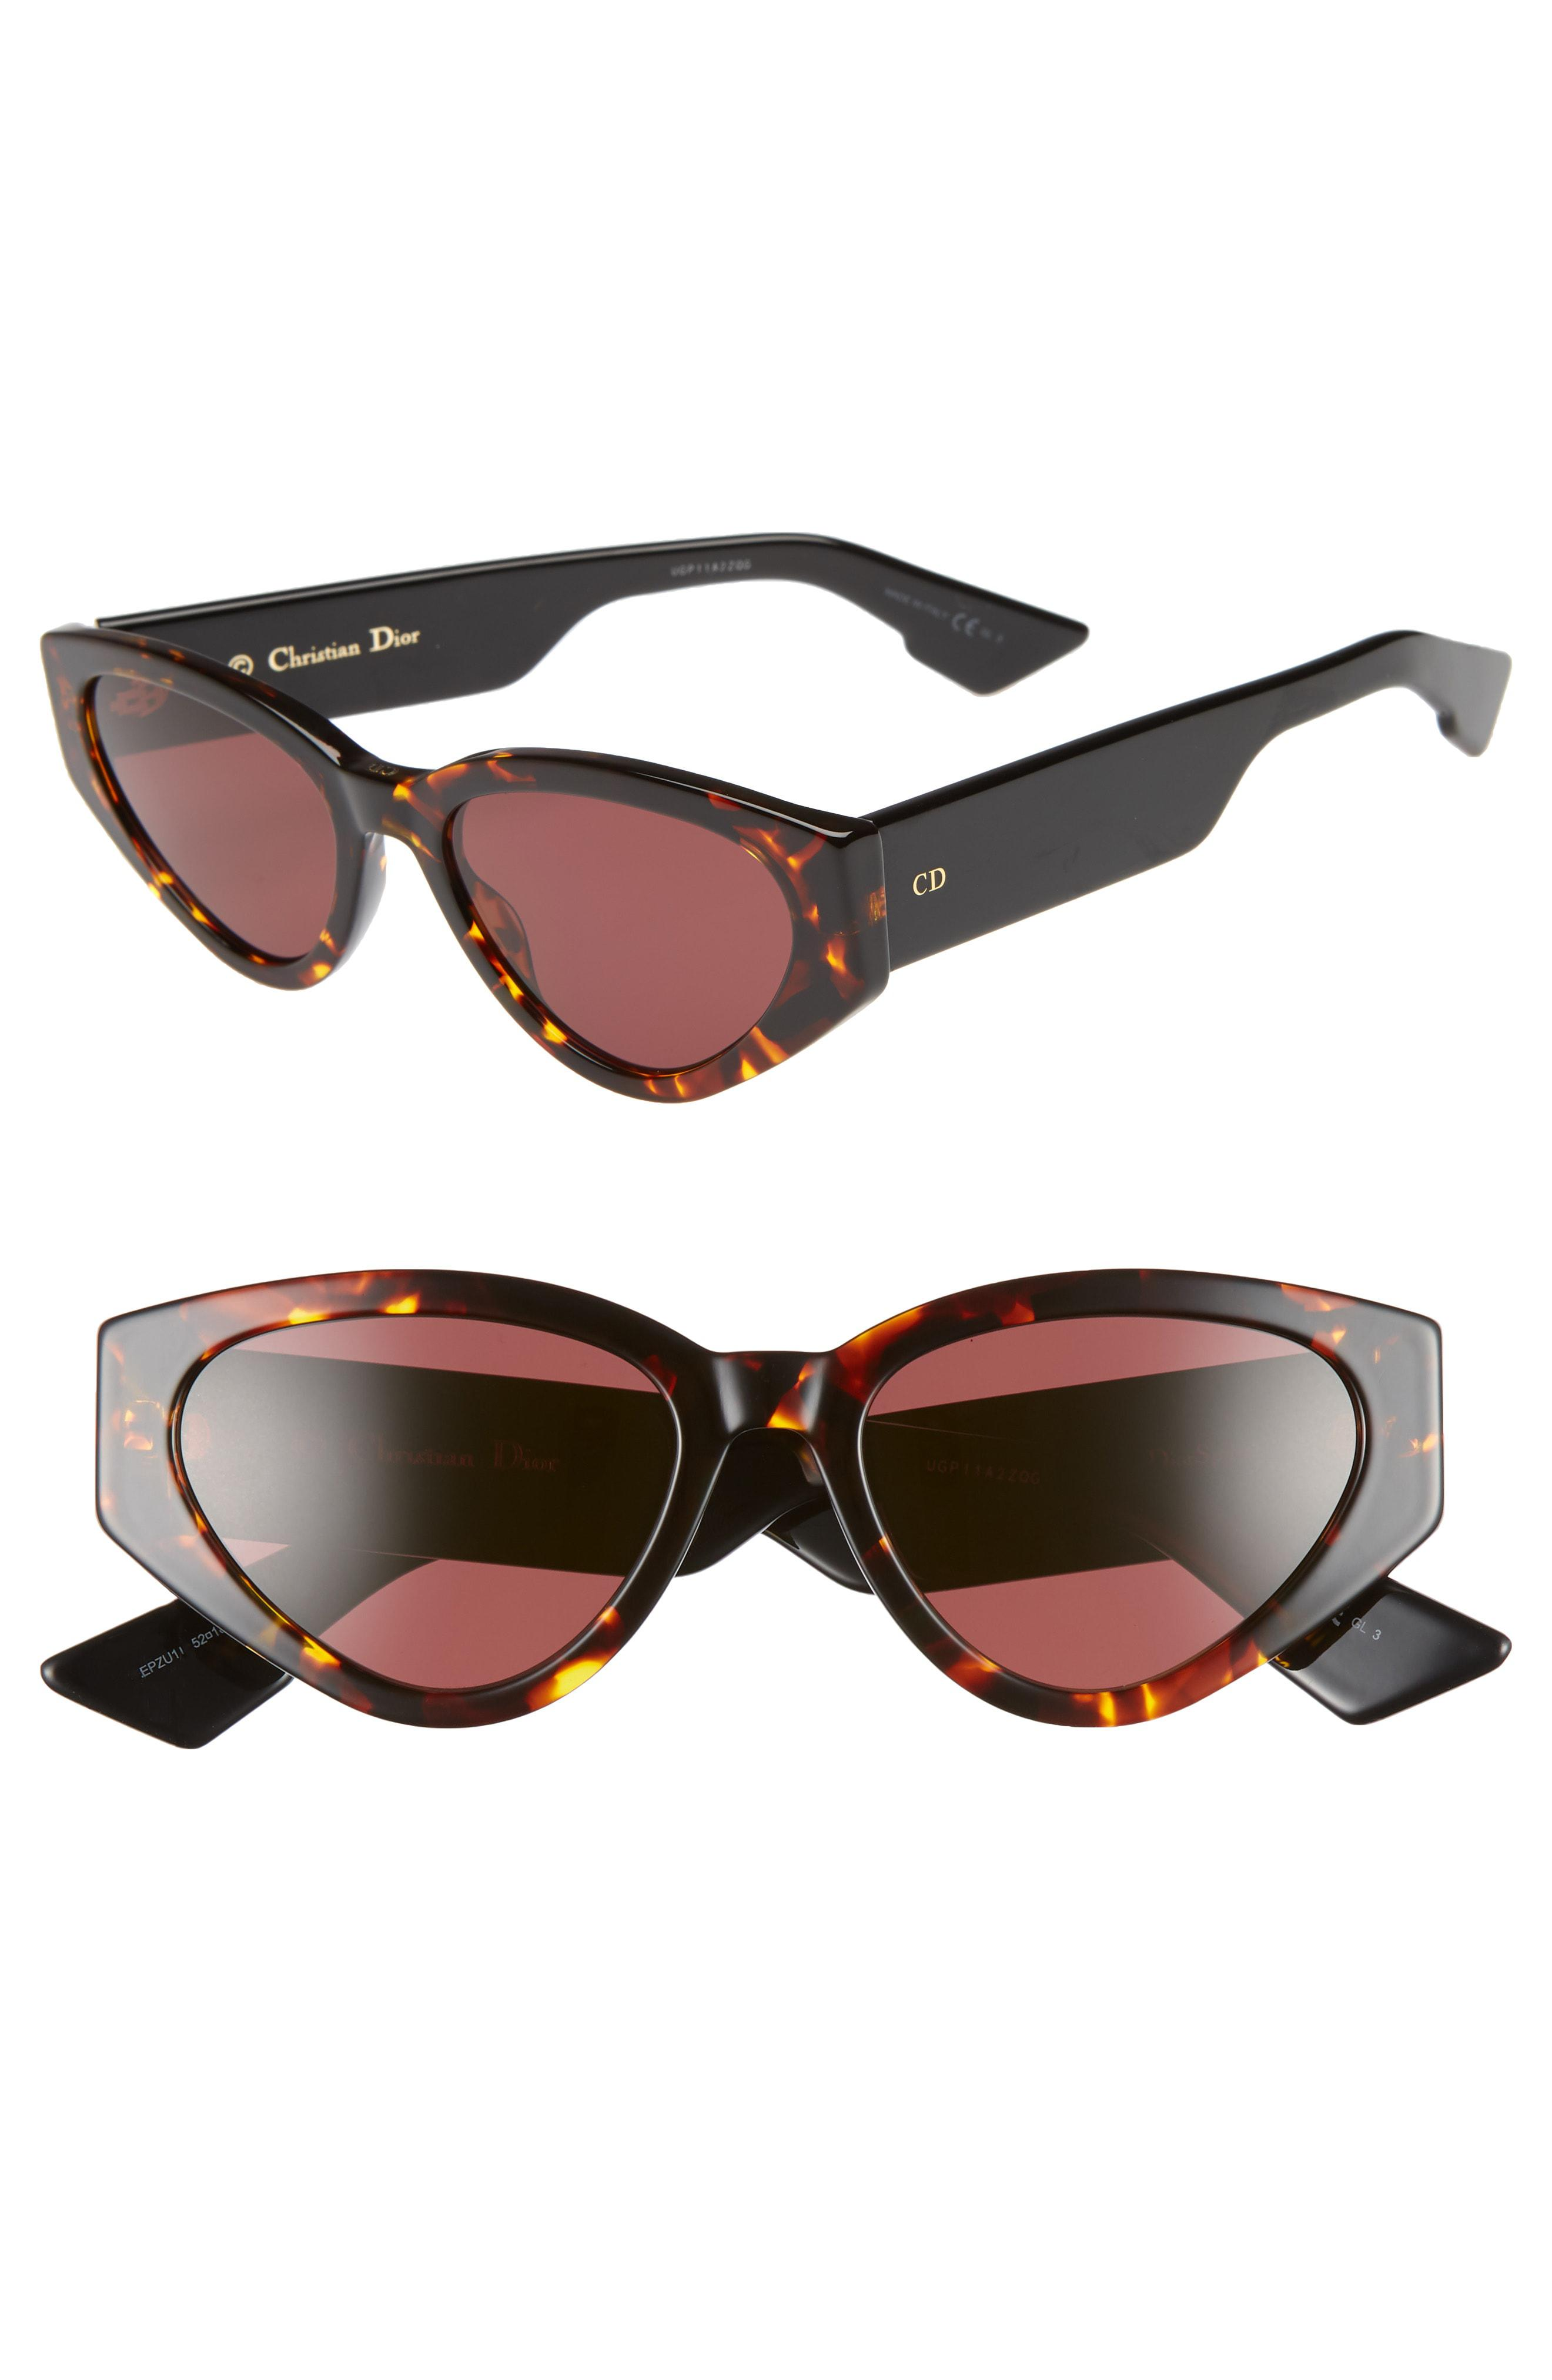 1be39a6466f2 Dior multicolor spirit cat eye sunglasses lyst jpg 2640x4048 Dior cat